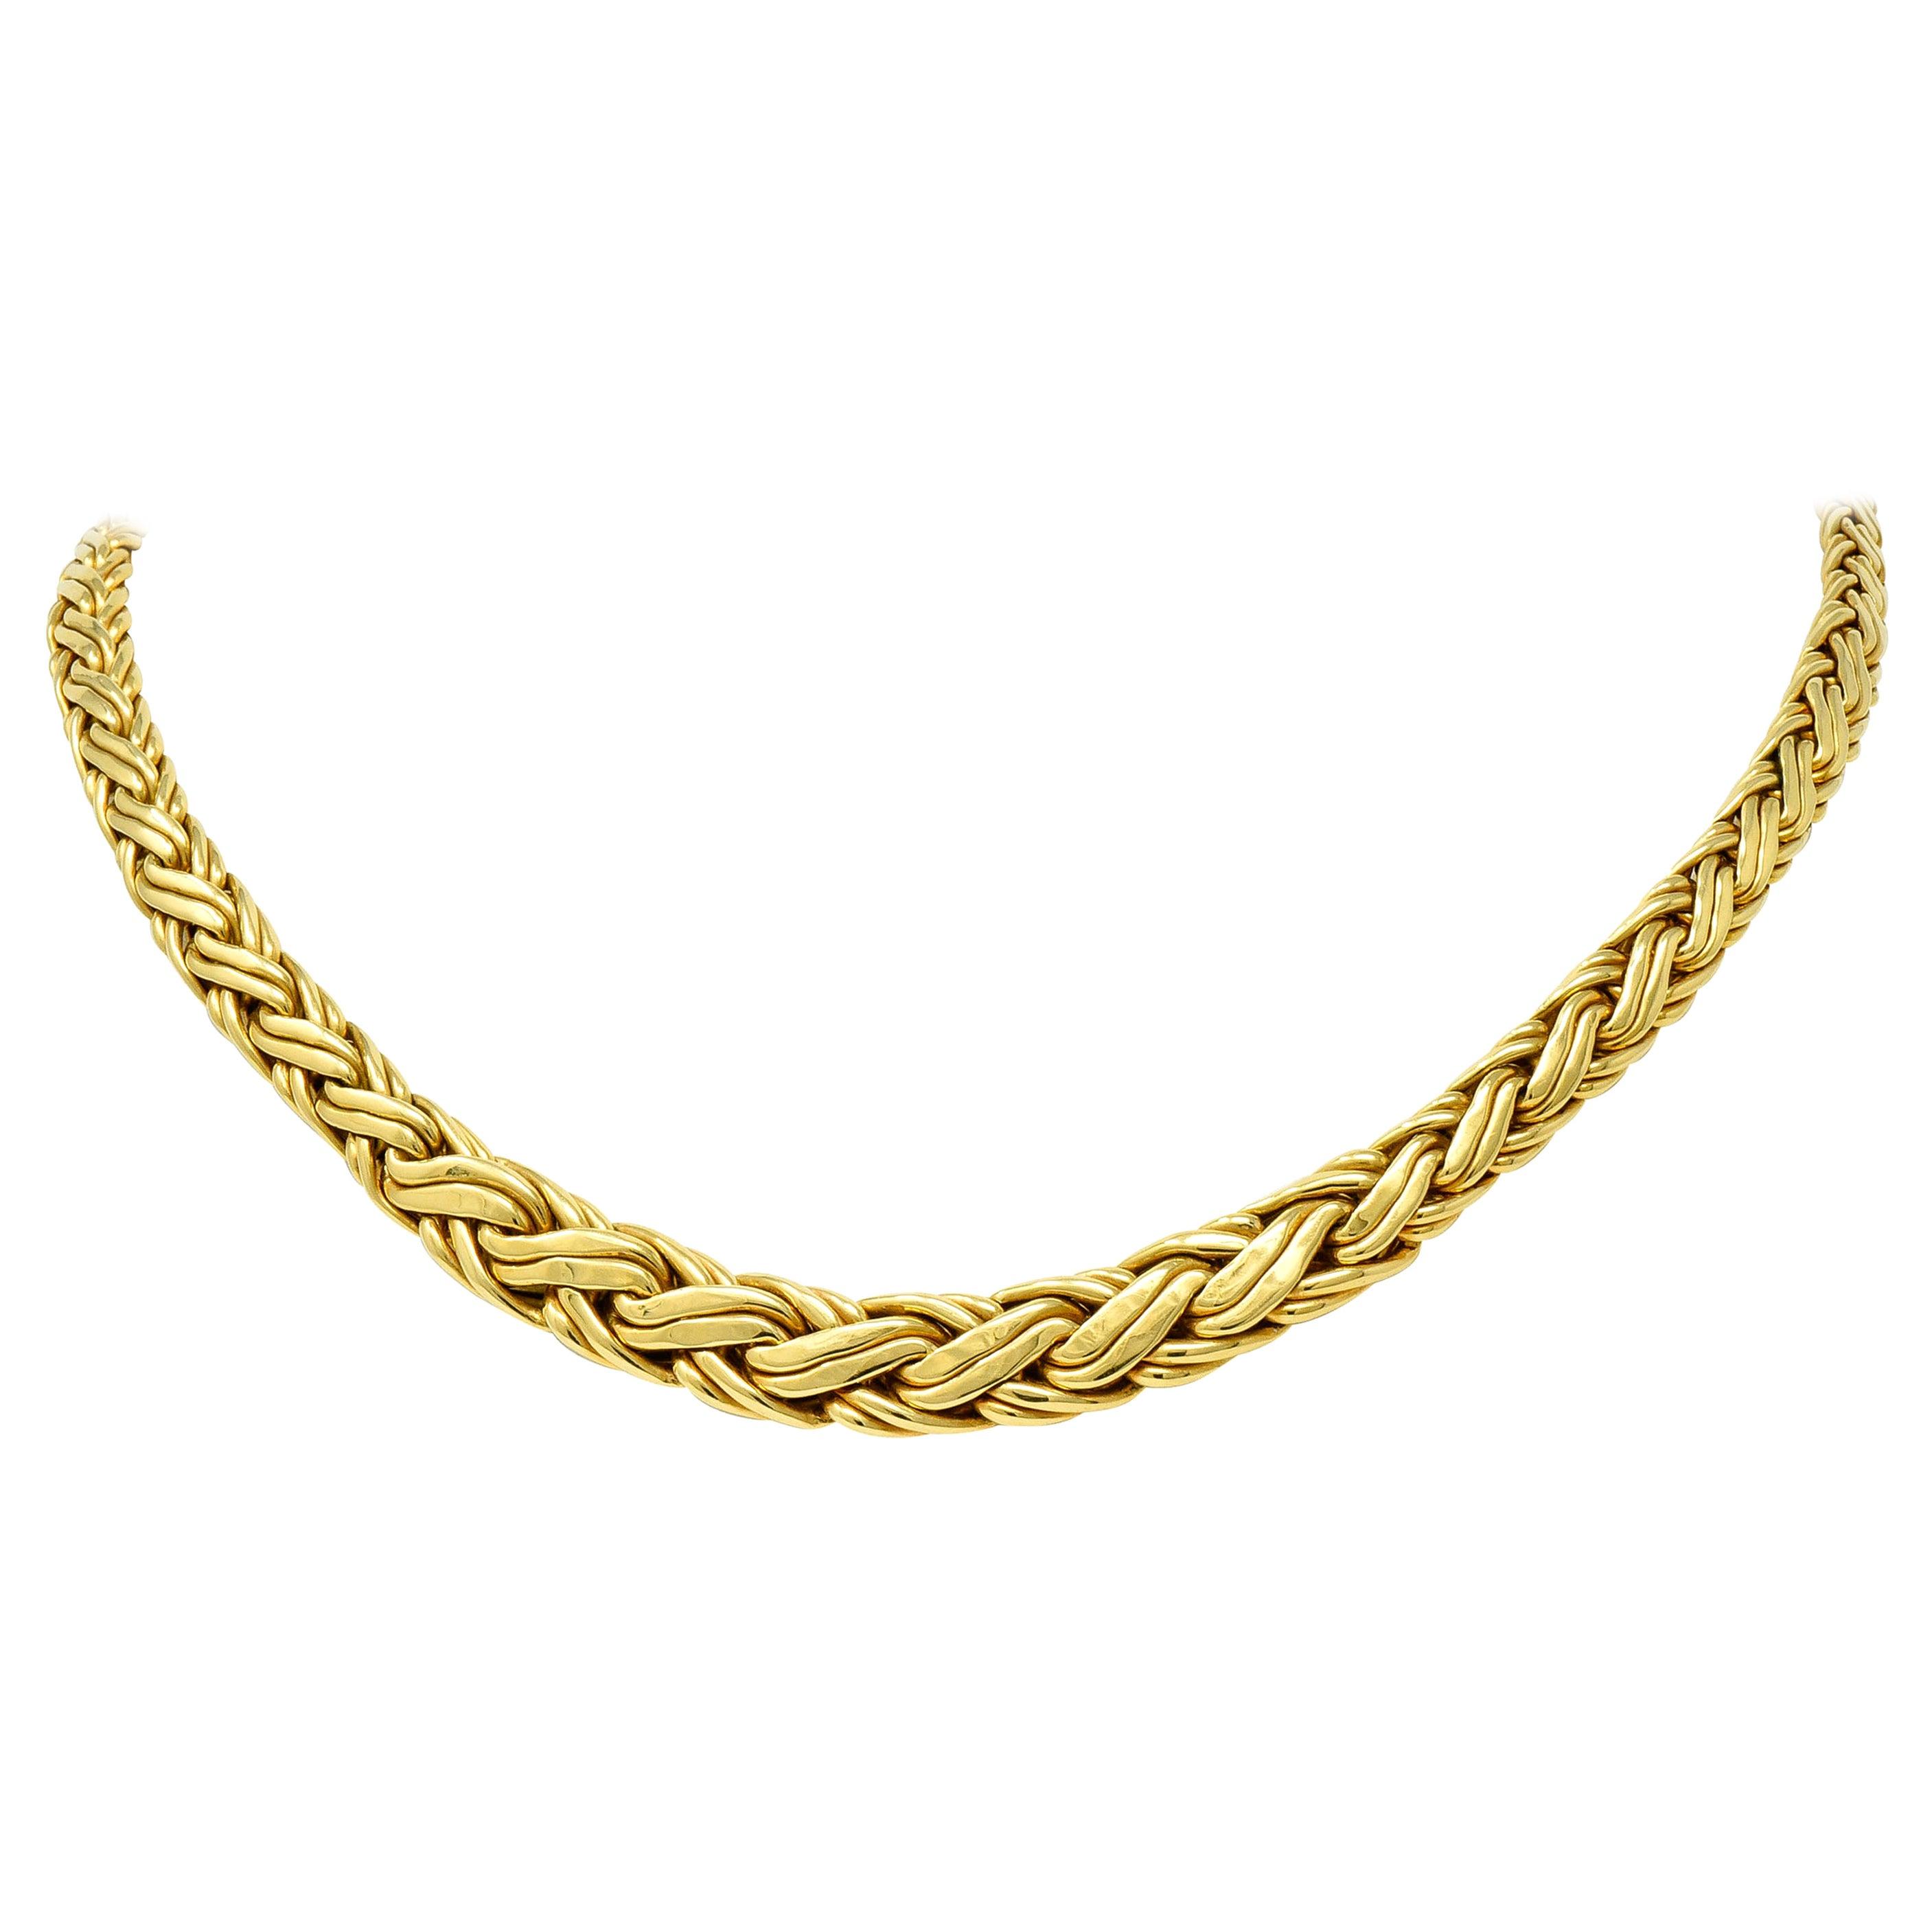 Tiffany & Co. 1980s Vintage 18 Karat Gold Wheat Chain Collar Necklace